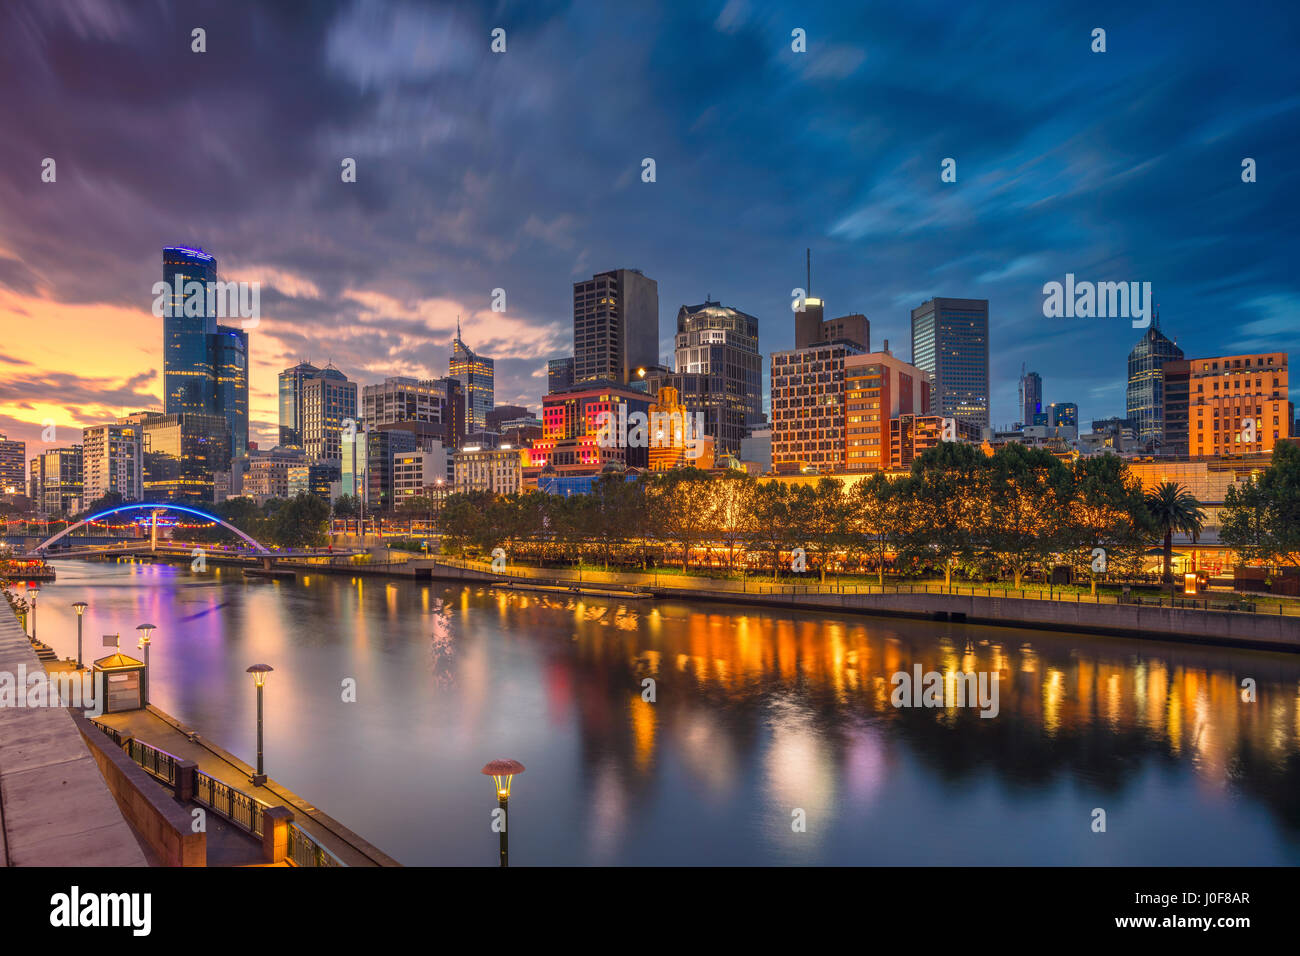 City of Melbourne. Cityscape image of Melbourne, Australia during dramatic sunset. - Stock Image